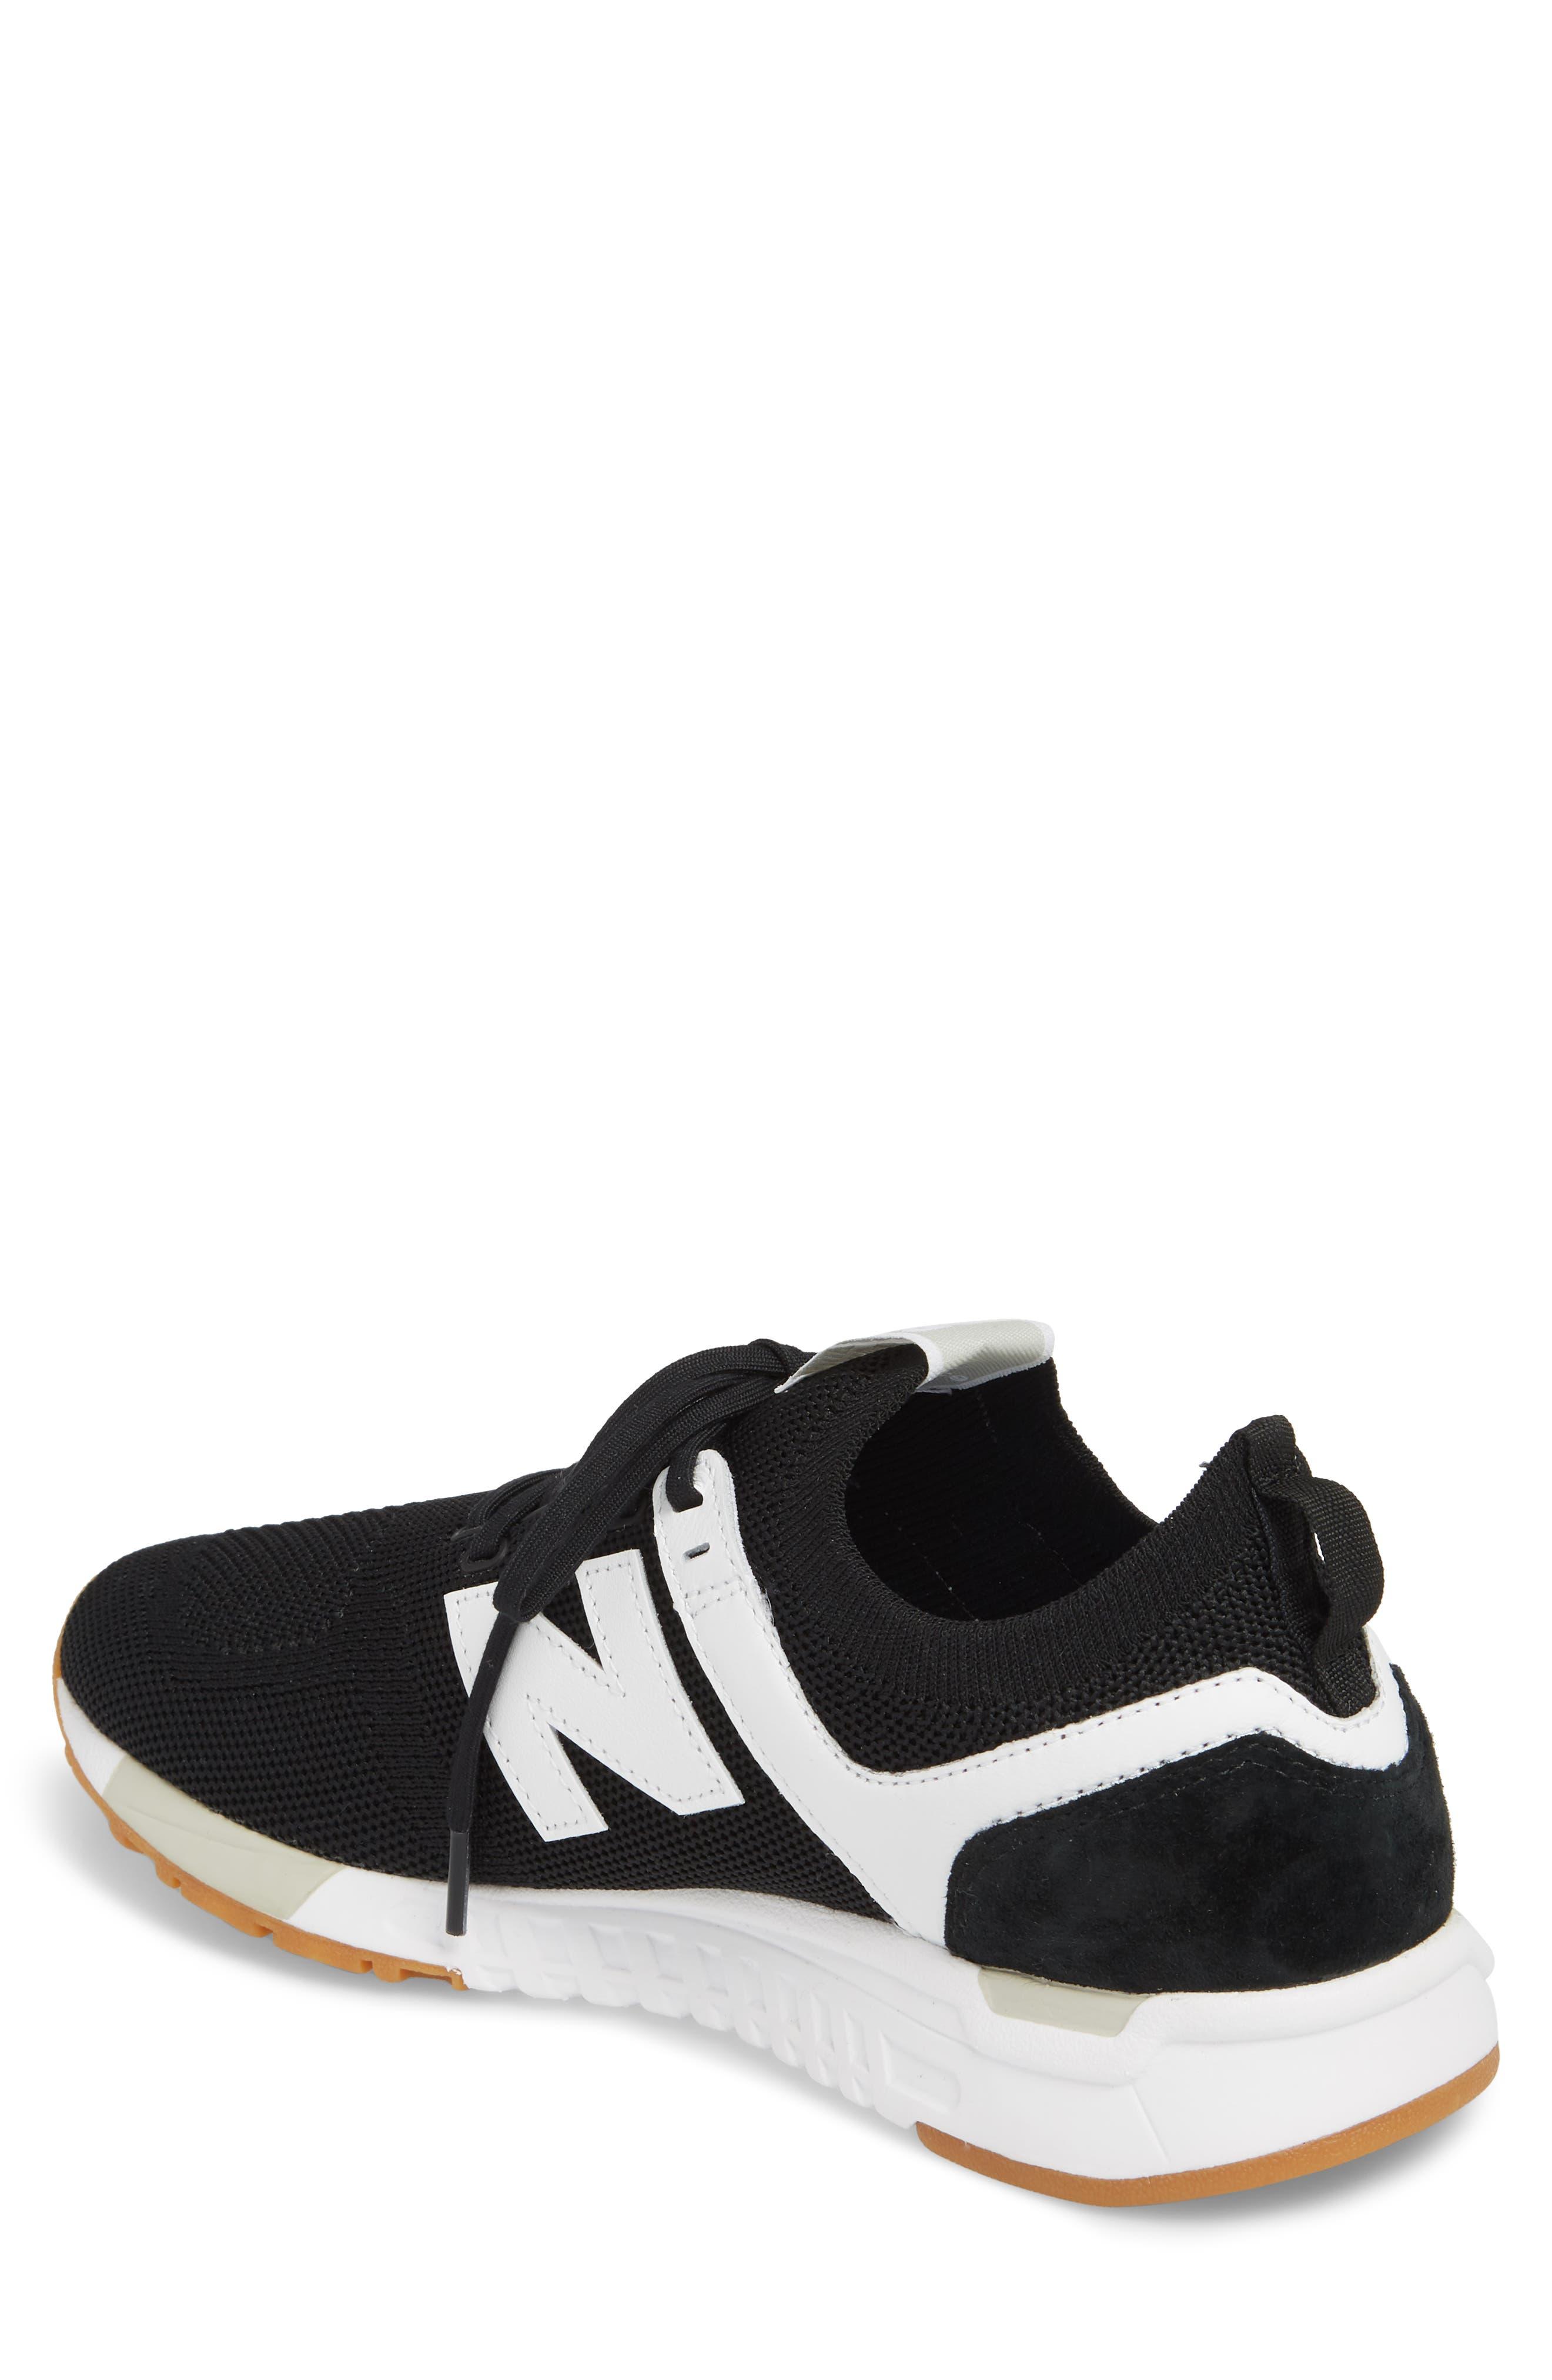 247 Decon Sneaker,                             Alternate thumbnail 2, color,                             001